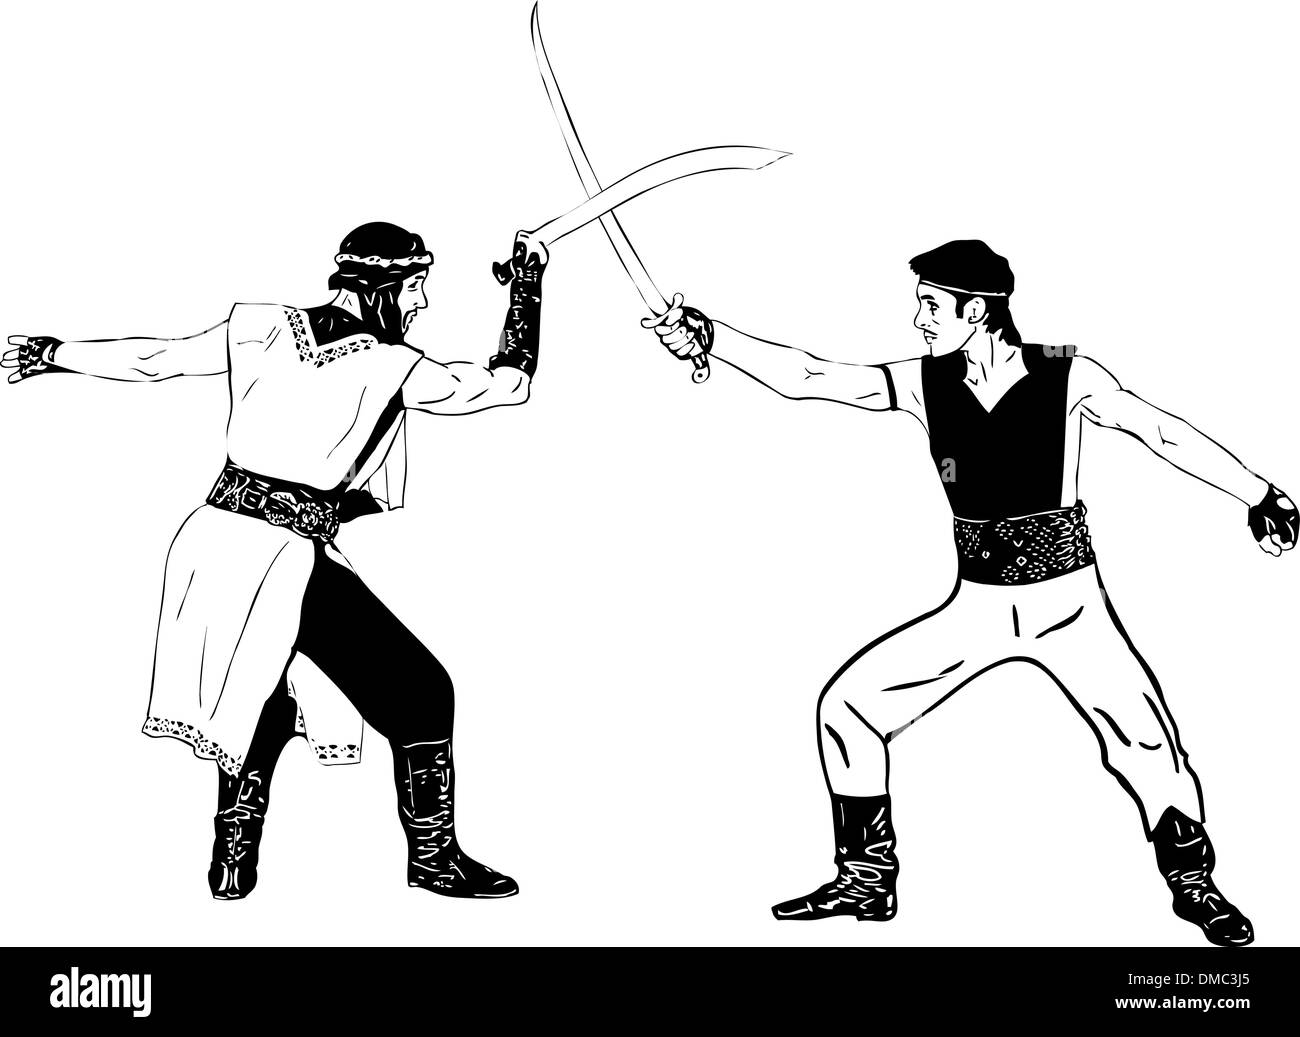 Warriors - Stock Image